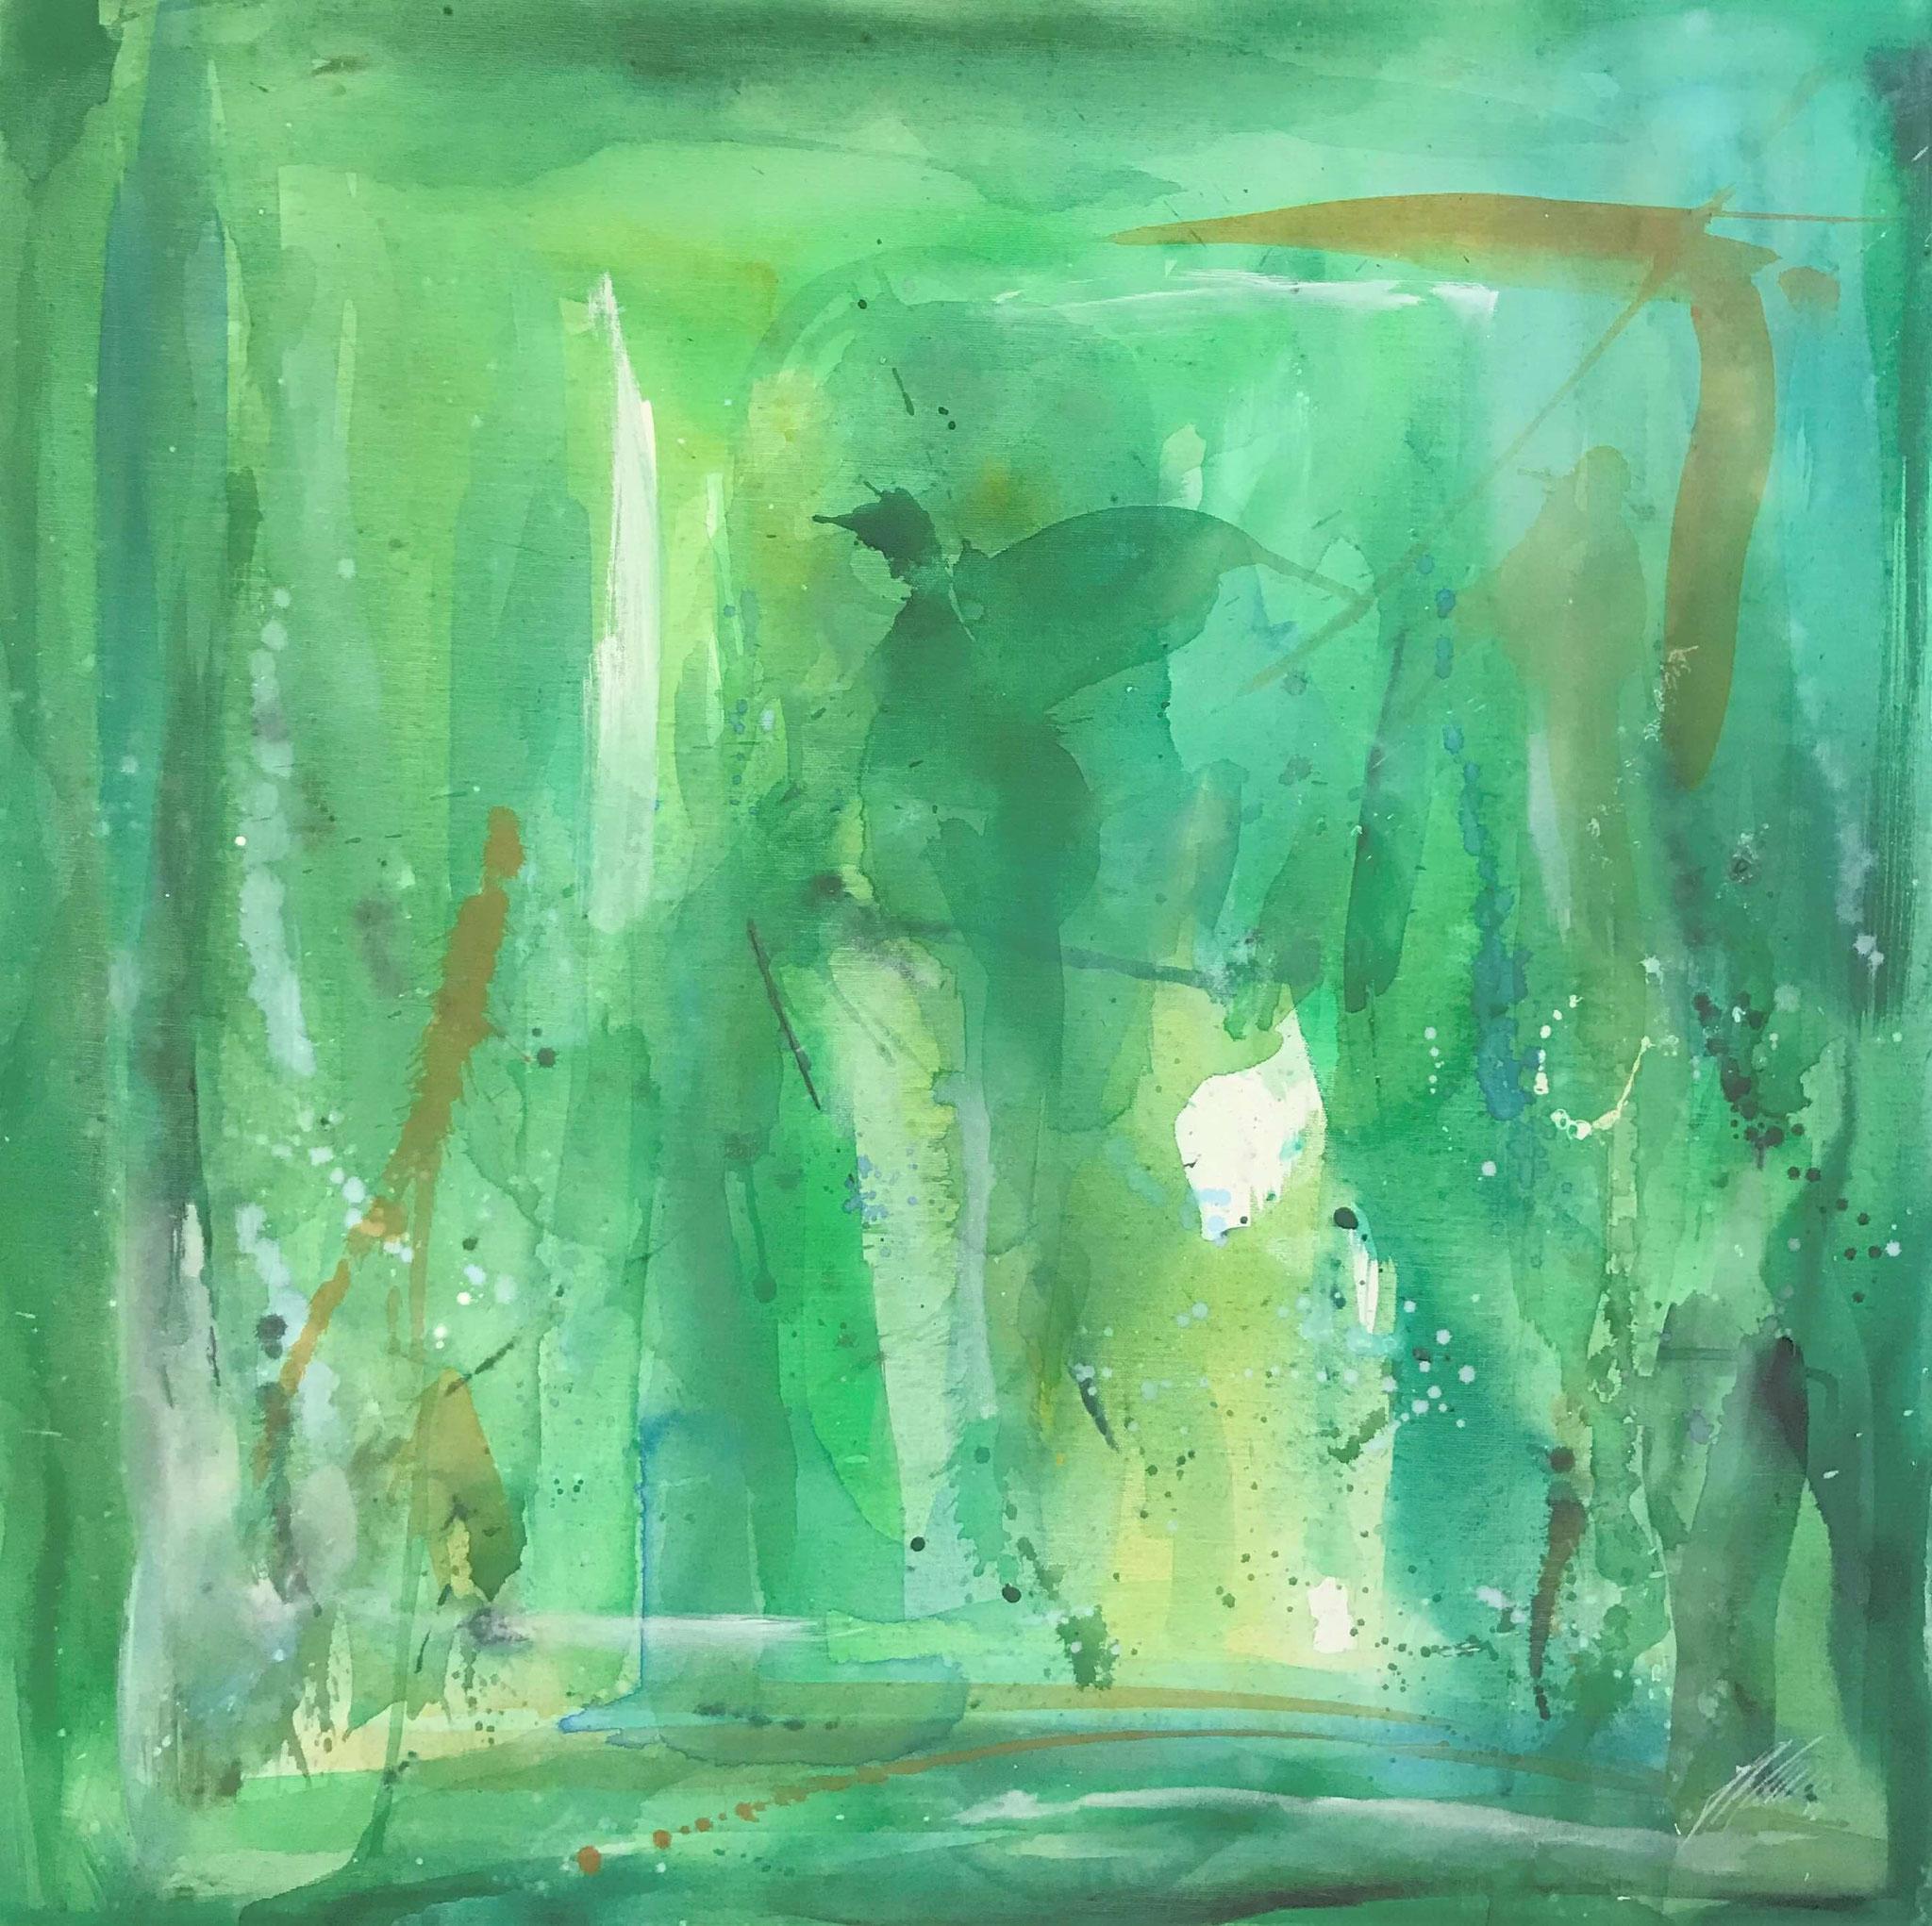 "Fr. 580.00 ""Jungfrau, Serie abstract"" Acryl auf Leinwand mit Rahmen 80 x 80cm."